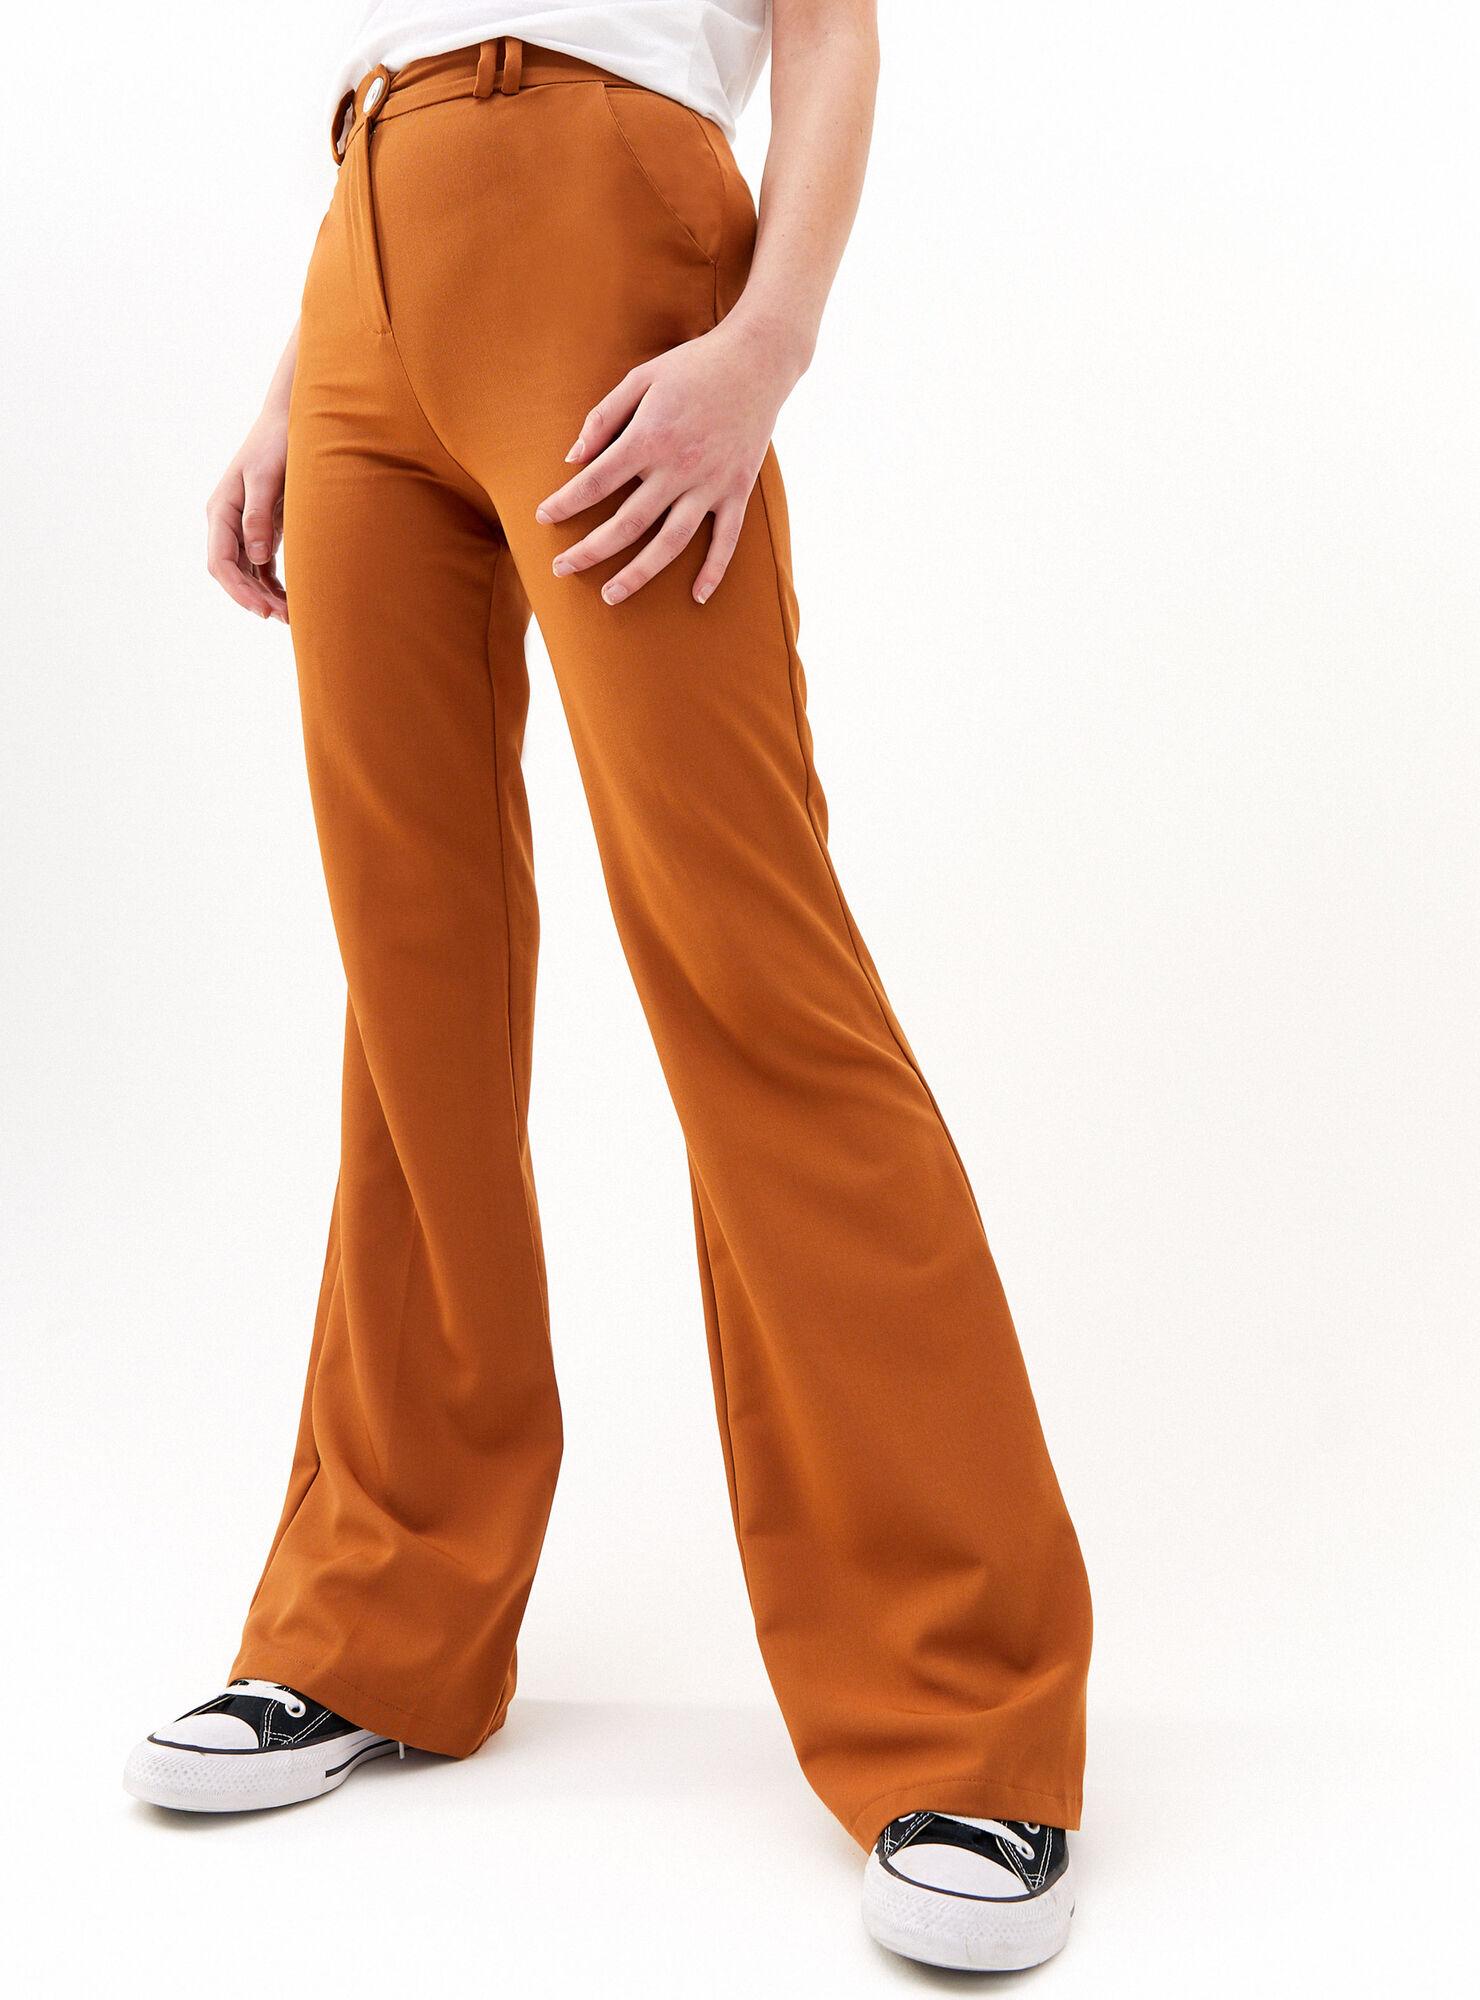 Pantalon Flare Bershka Jeans Y Pantalones Paris Cl